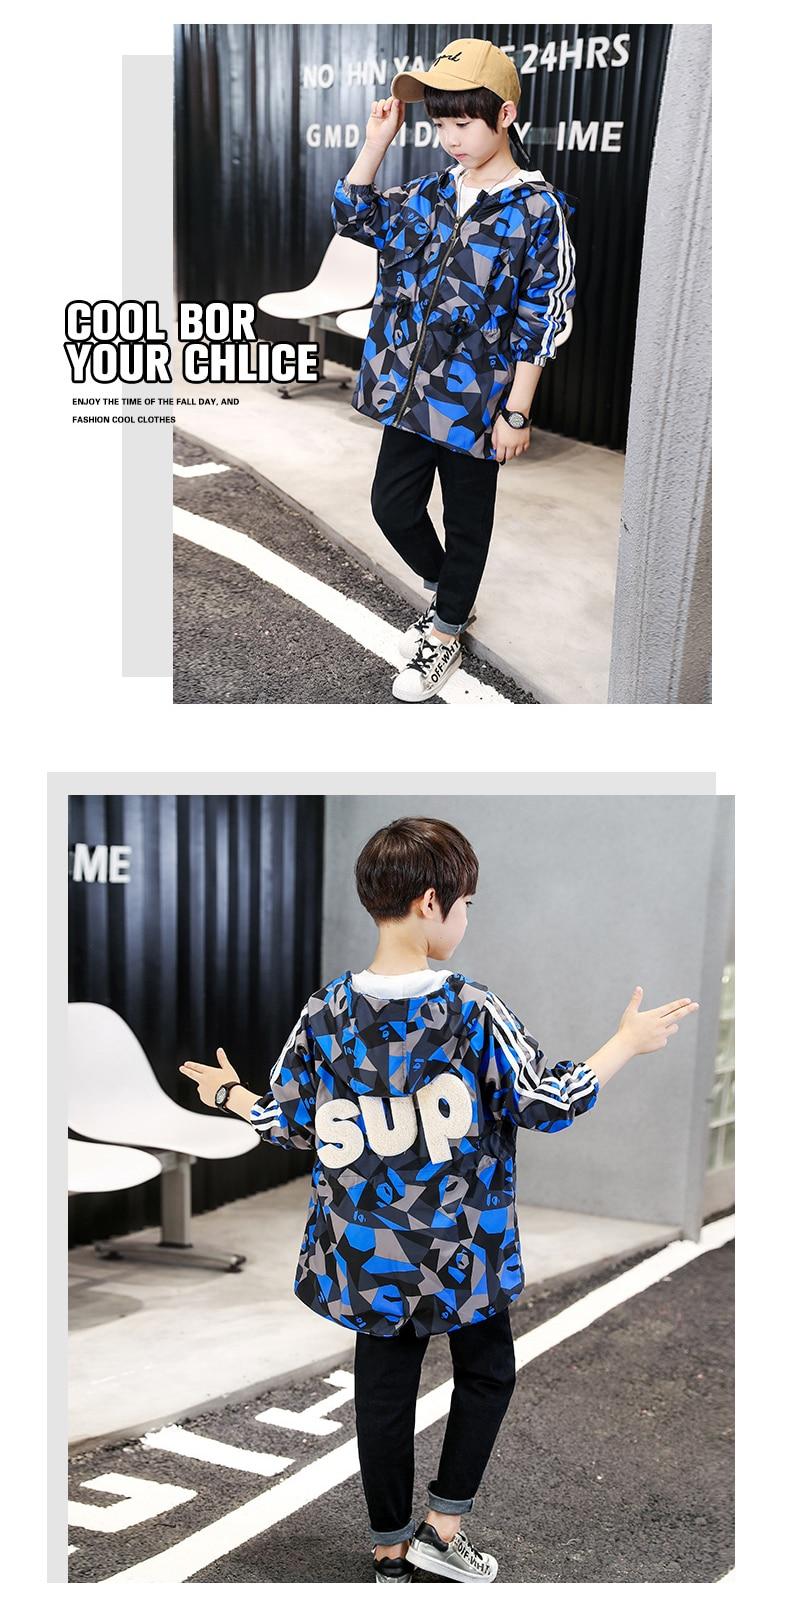 bcc5332c554a Trench Coat Boy Autumn 2018 Print Windbreaker Jackets Long Sleeve ...